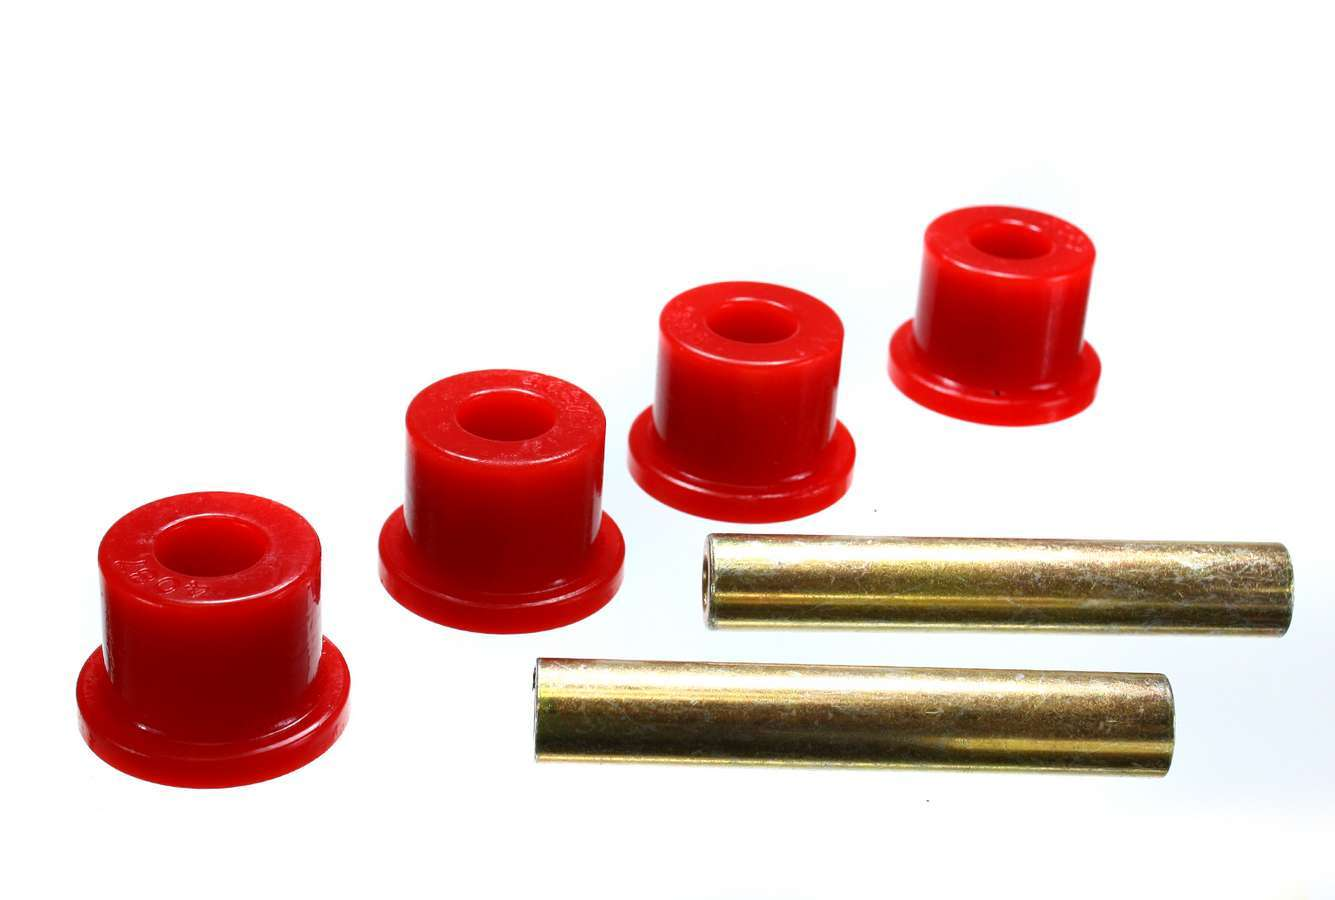 Energy Suspension 4-1102R Crossmember Bushing, Hyper-Flex, Transmission, Polyurethane / Steel, Red / Cadmium, Ford Mustang 1979-93, Kit